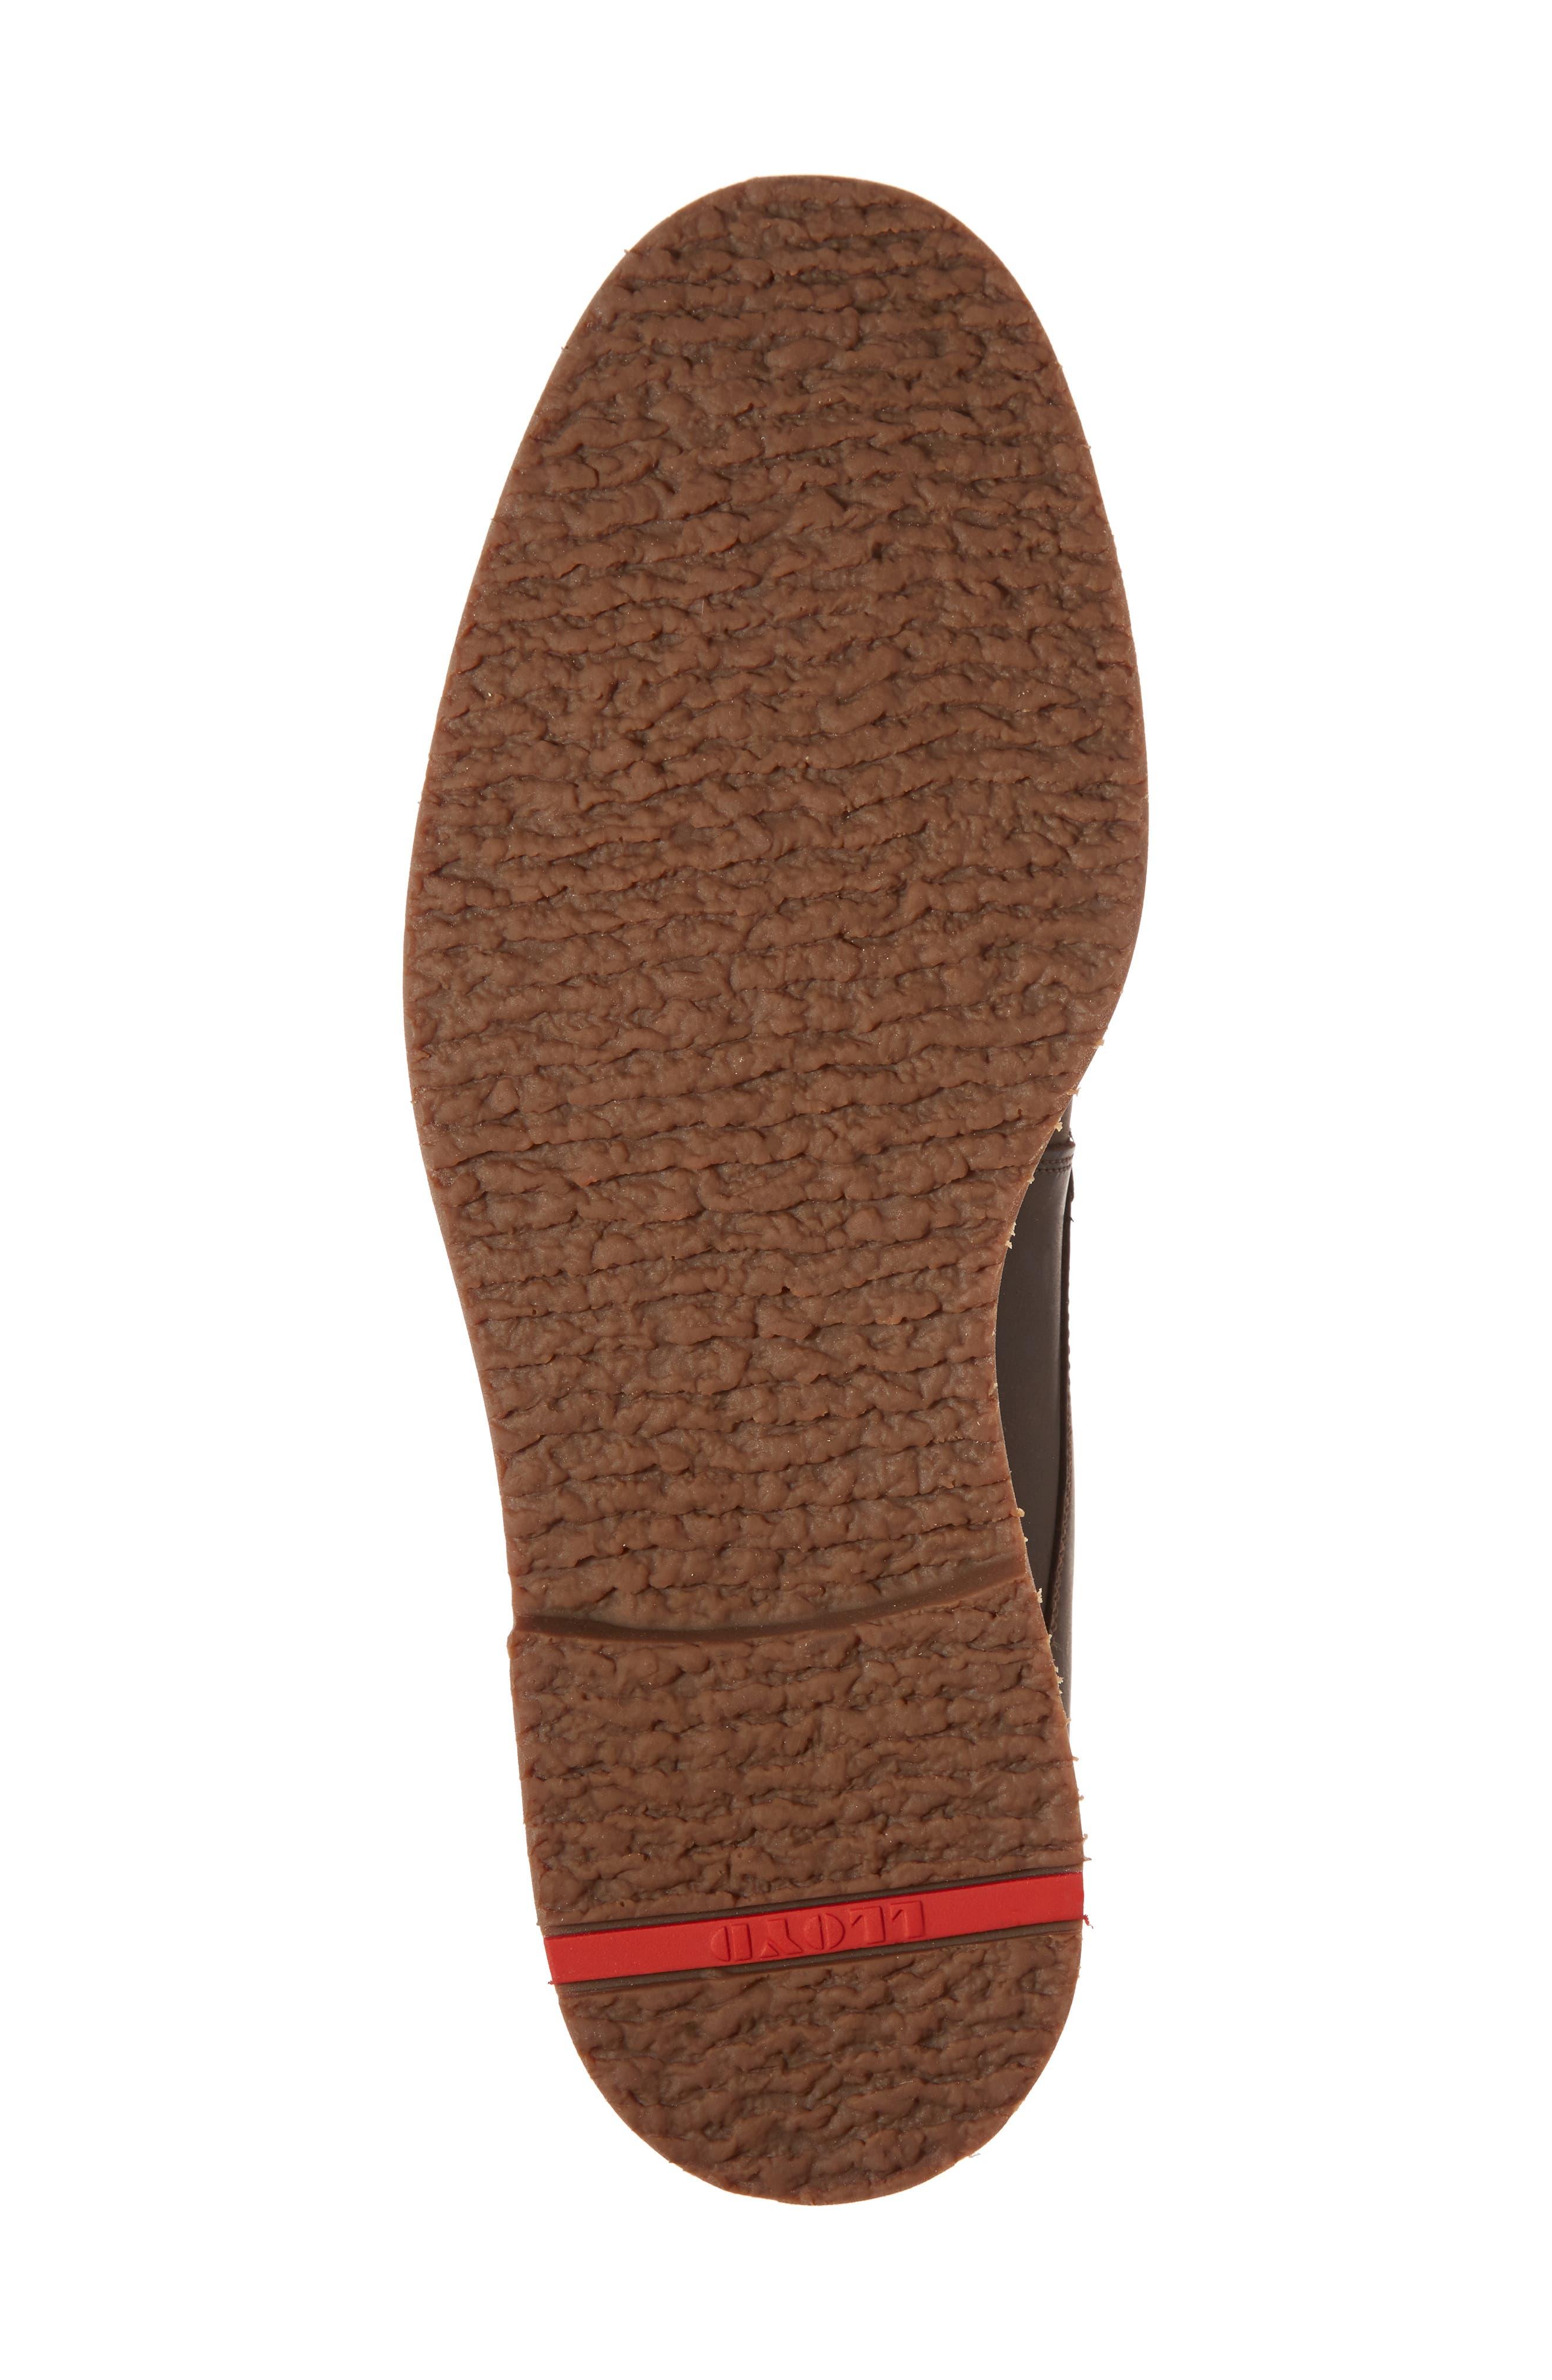 Varus Waterproof Shearlng Lined Chukka Boot,                             Alternate thumbnail 6, color,                             Ebony Leather